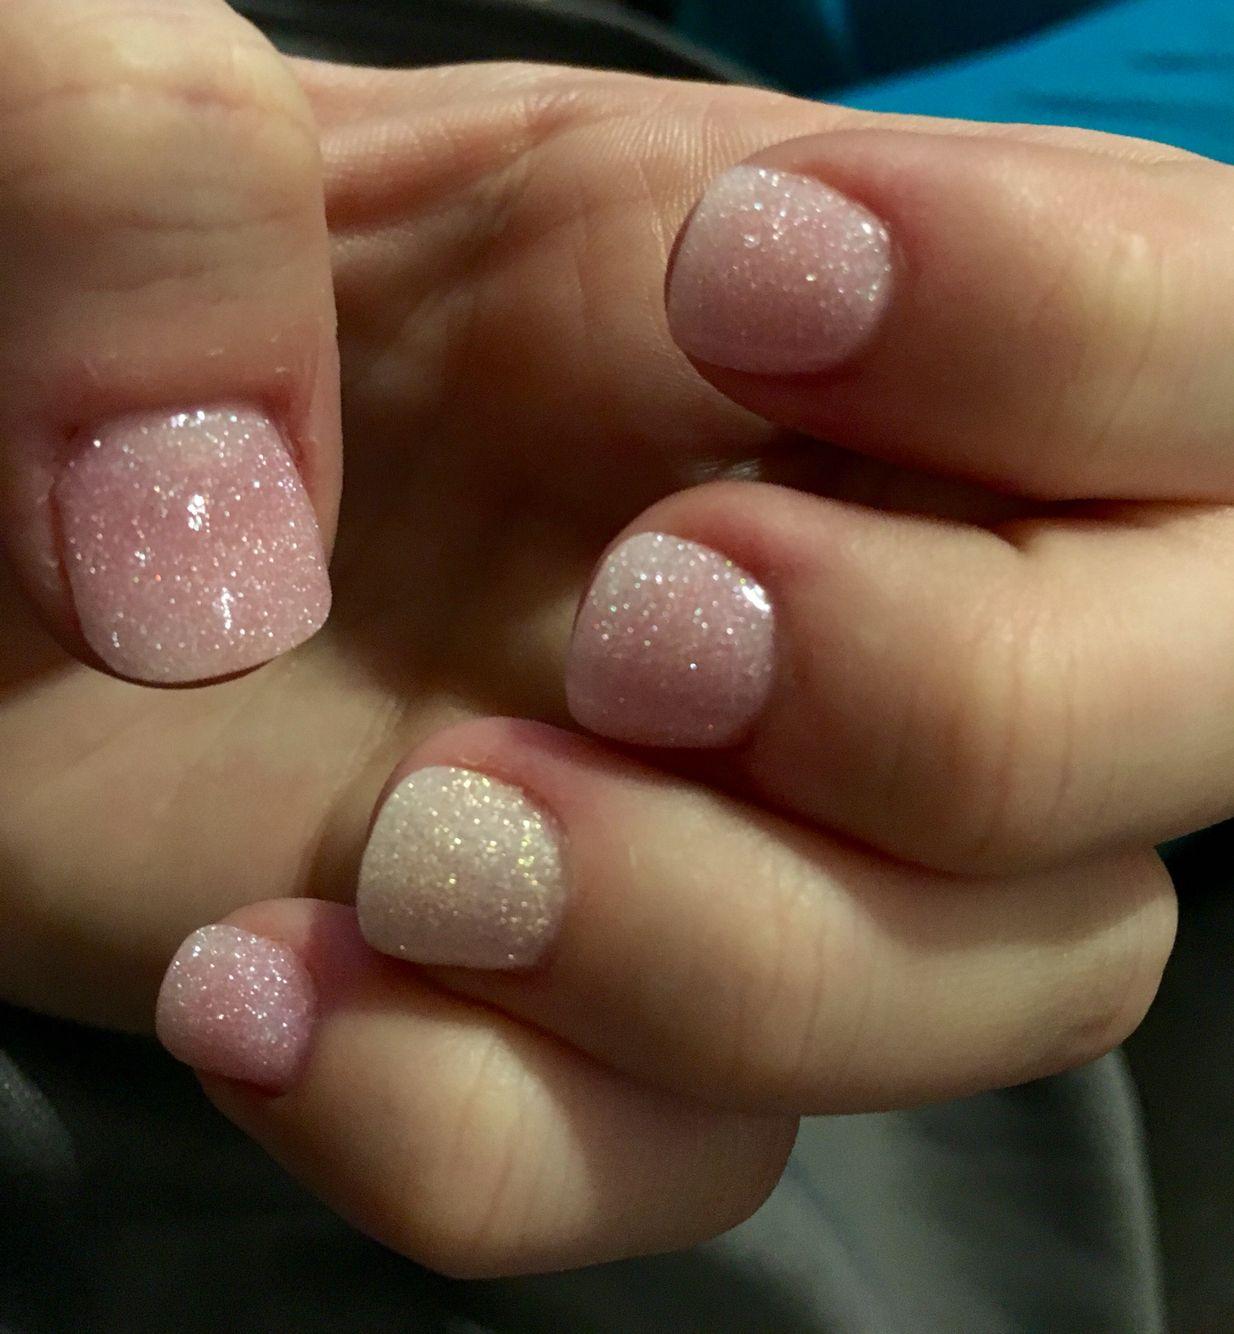 Pink Glitter White Powder Dipped Nails Manicure Mani Winter Natural